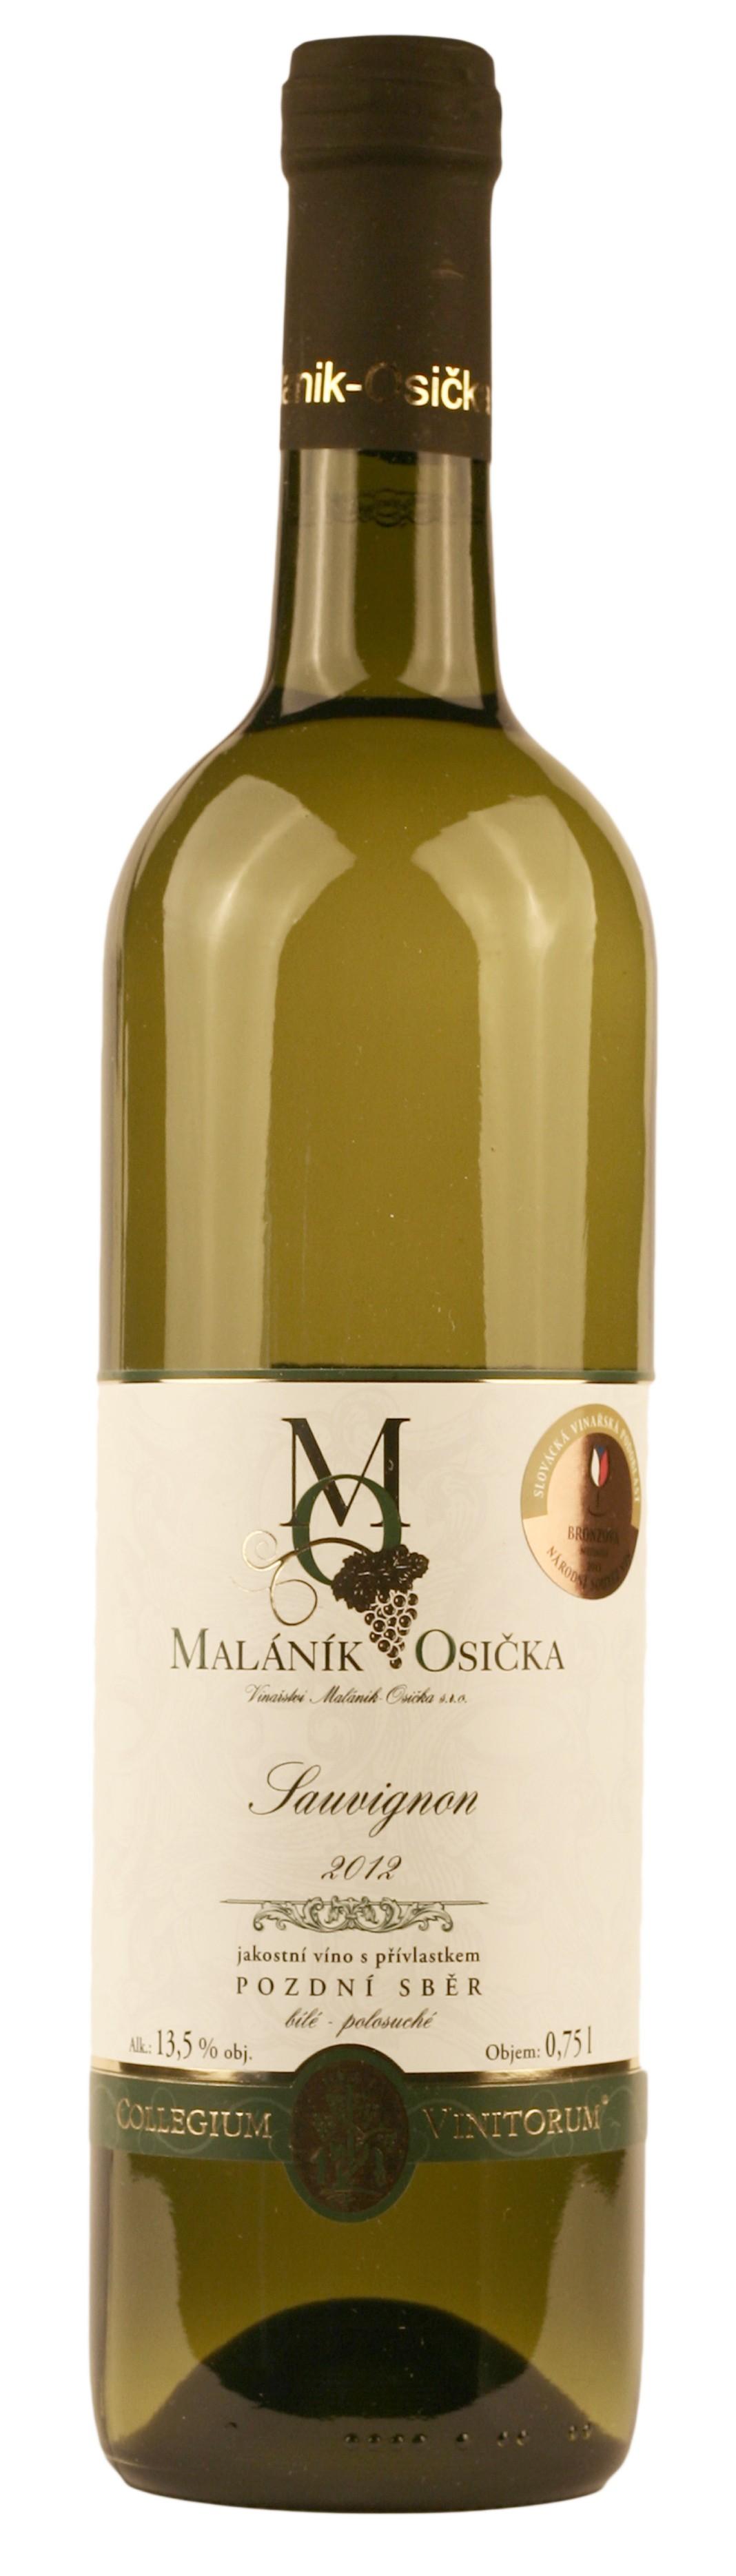 https://www.wineandgallery.cz/189-thickbox_default/sauvignon-.jpg